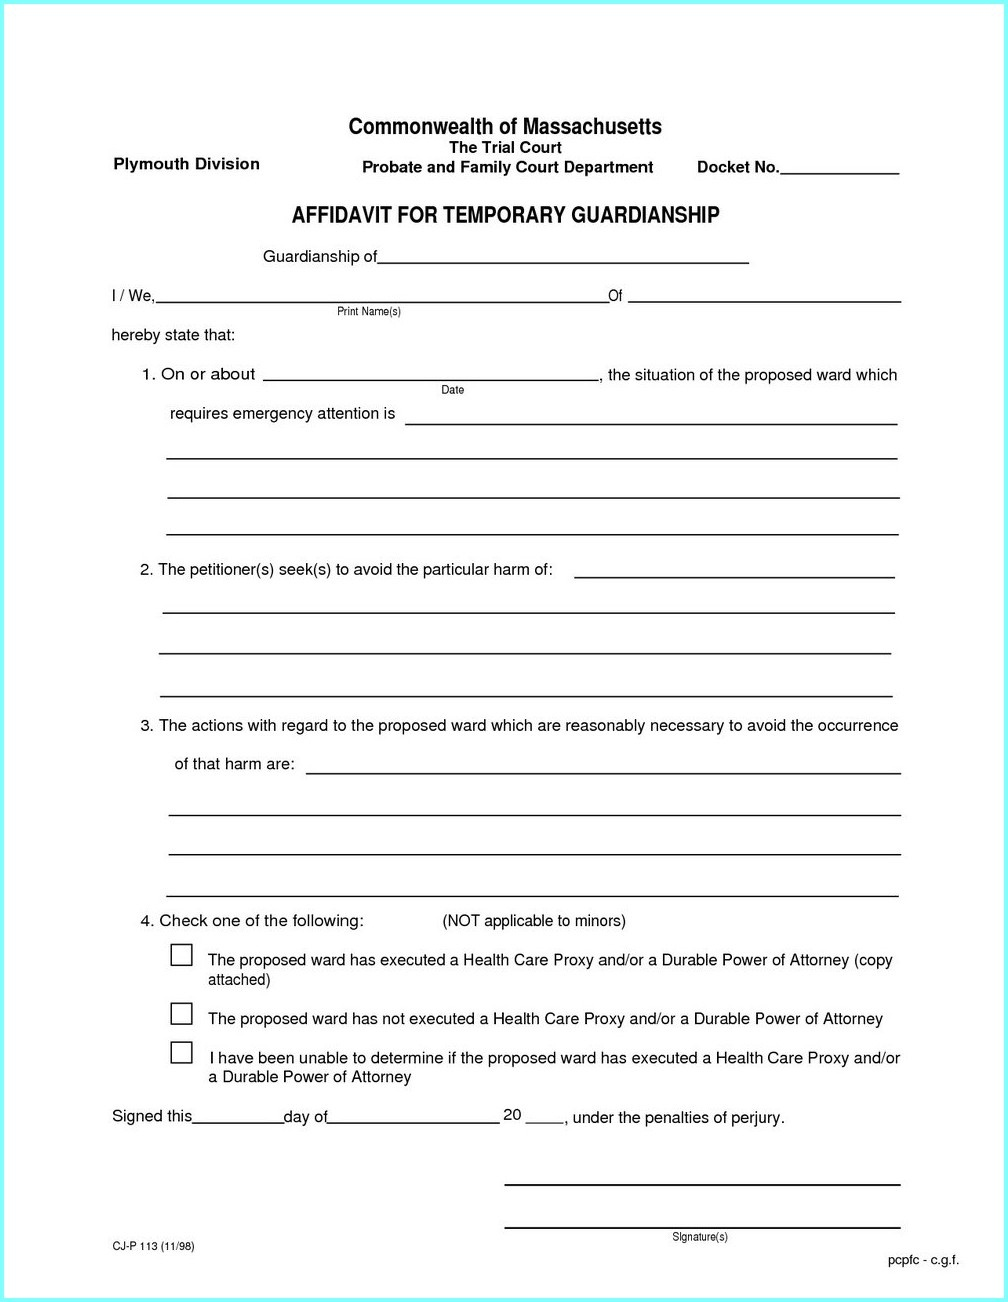 Temporary Guardianship Forms Texas - Form : Resume Examples #y23Akqaq0N - Free Printable Guardianship Forms Texas